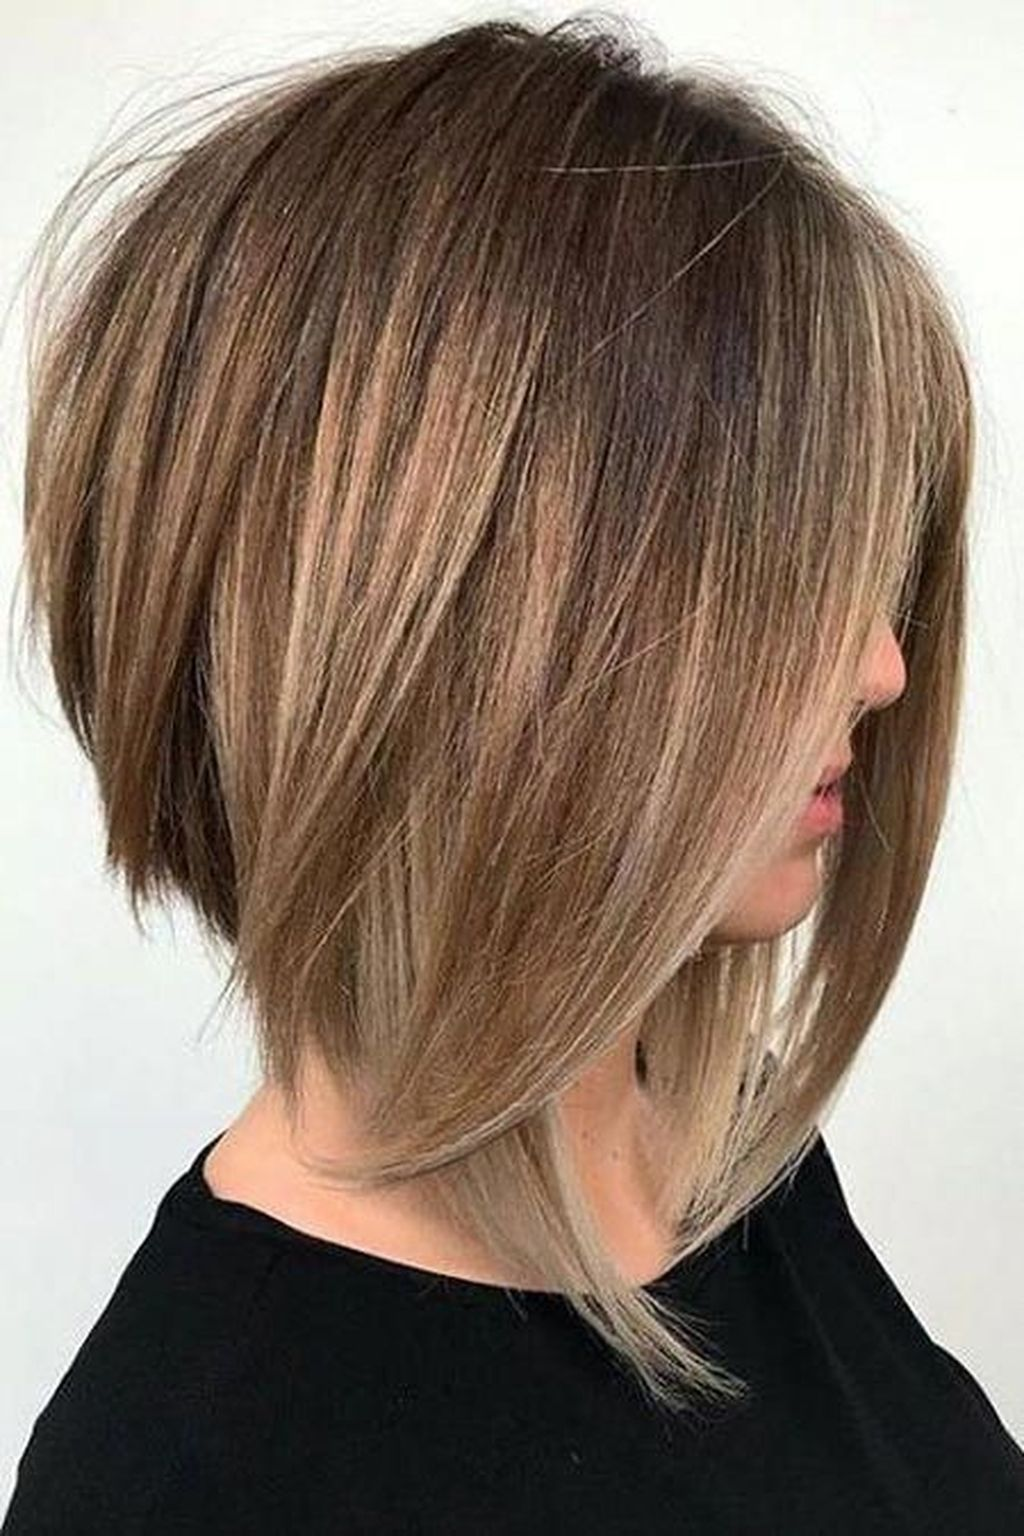 40 Astonishing Bob Hairstyles Ideas That Look Great On Everyone Short Hair Haircuts Thick Hair Styles Short Hair Model